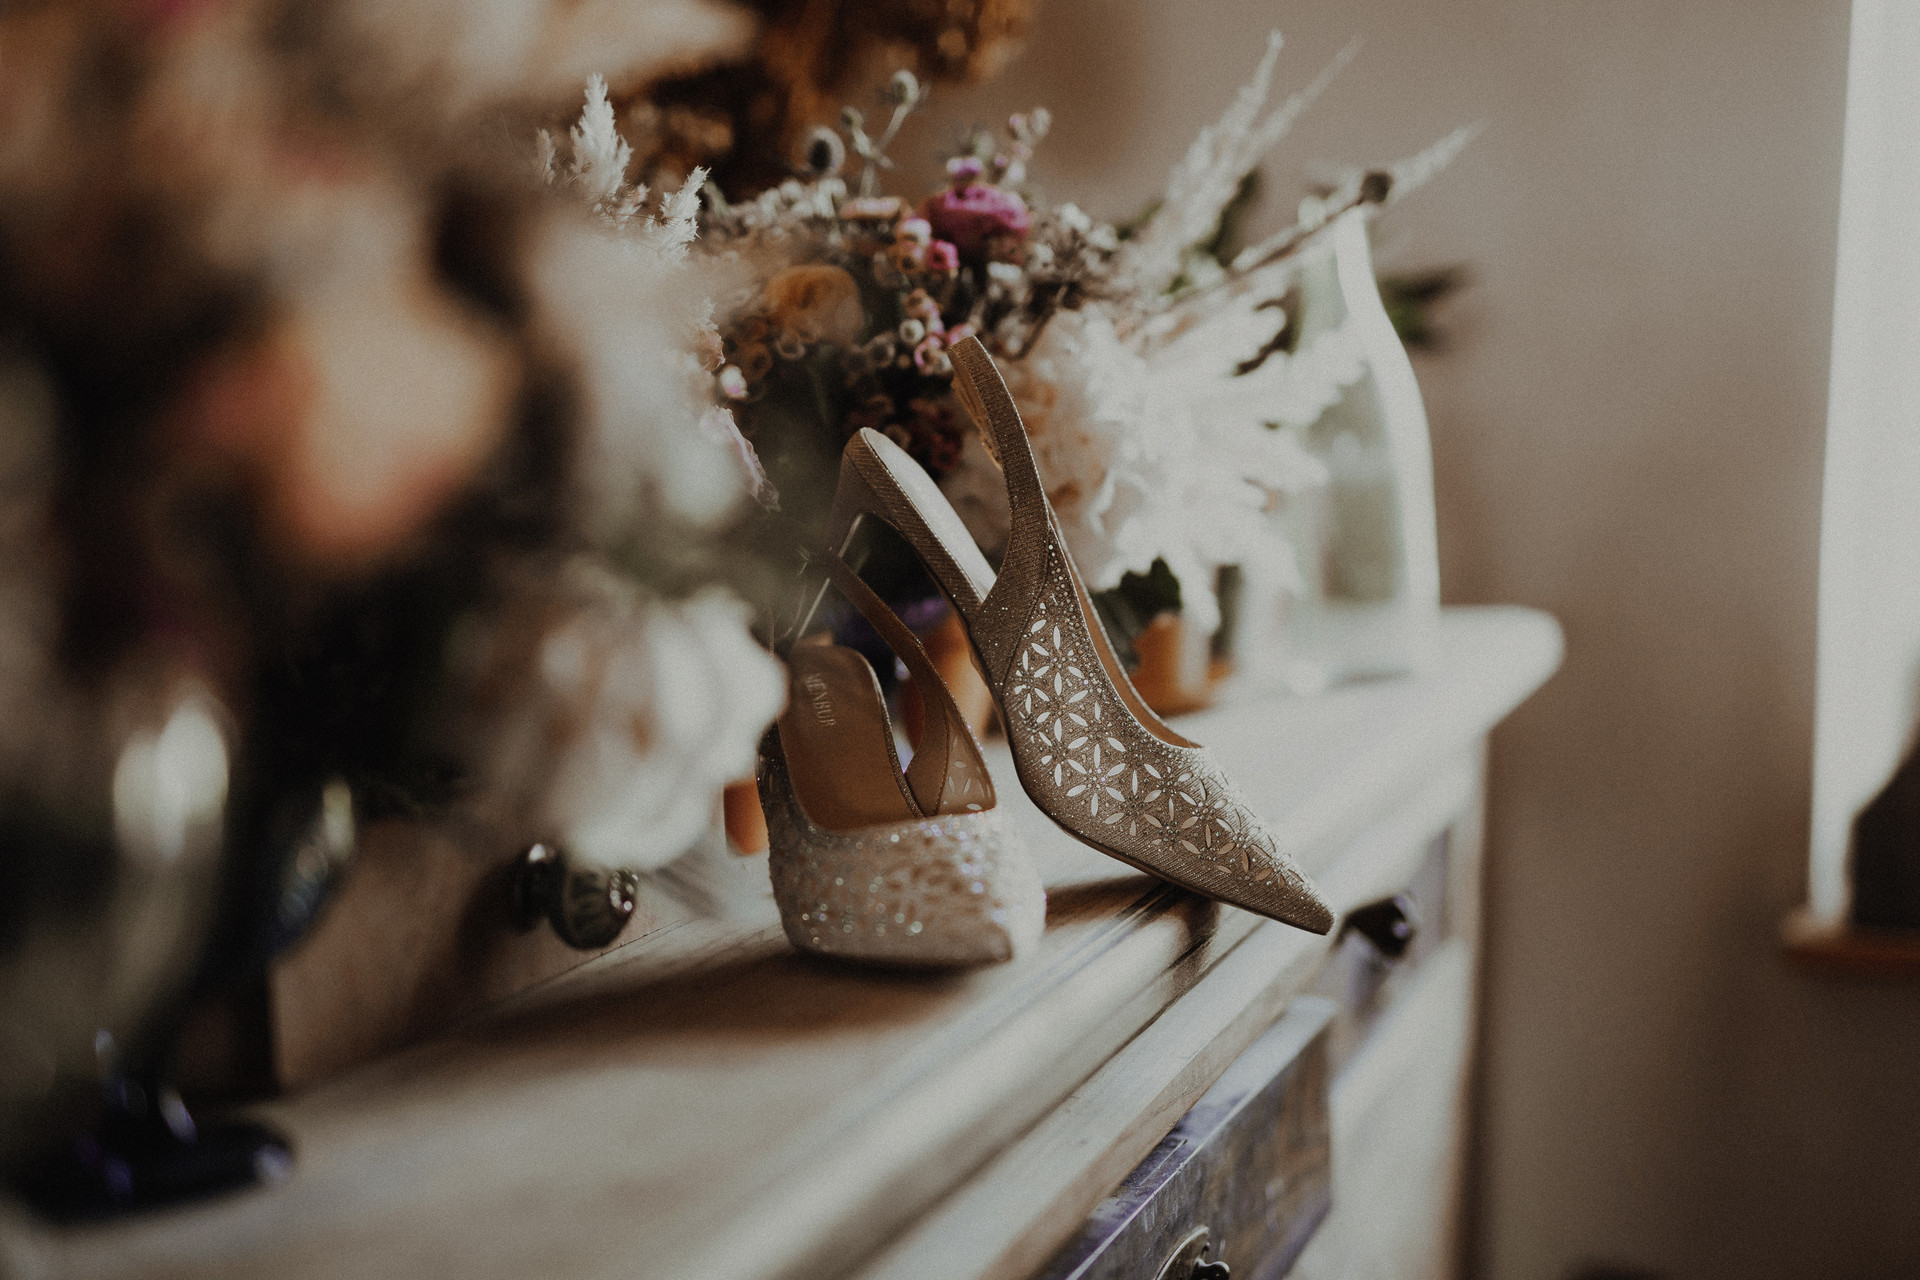 szpilki na wesele